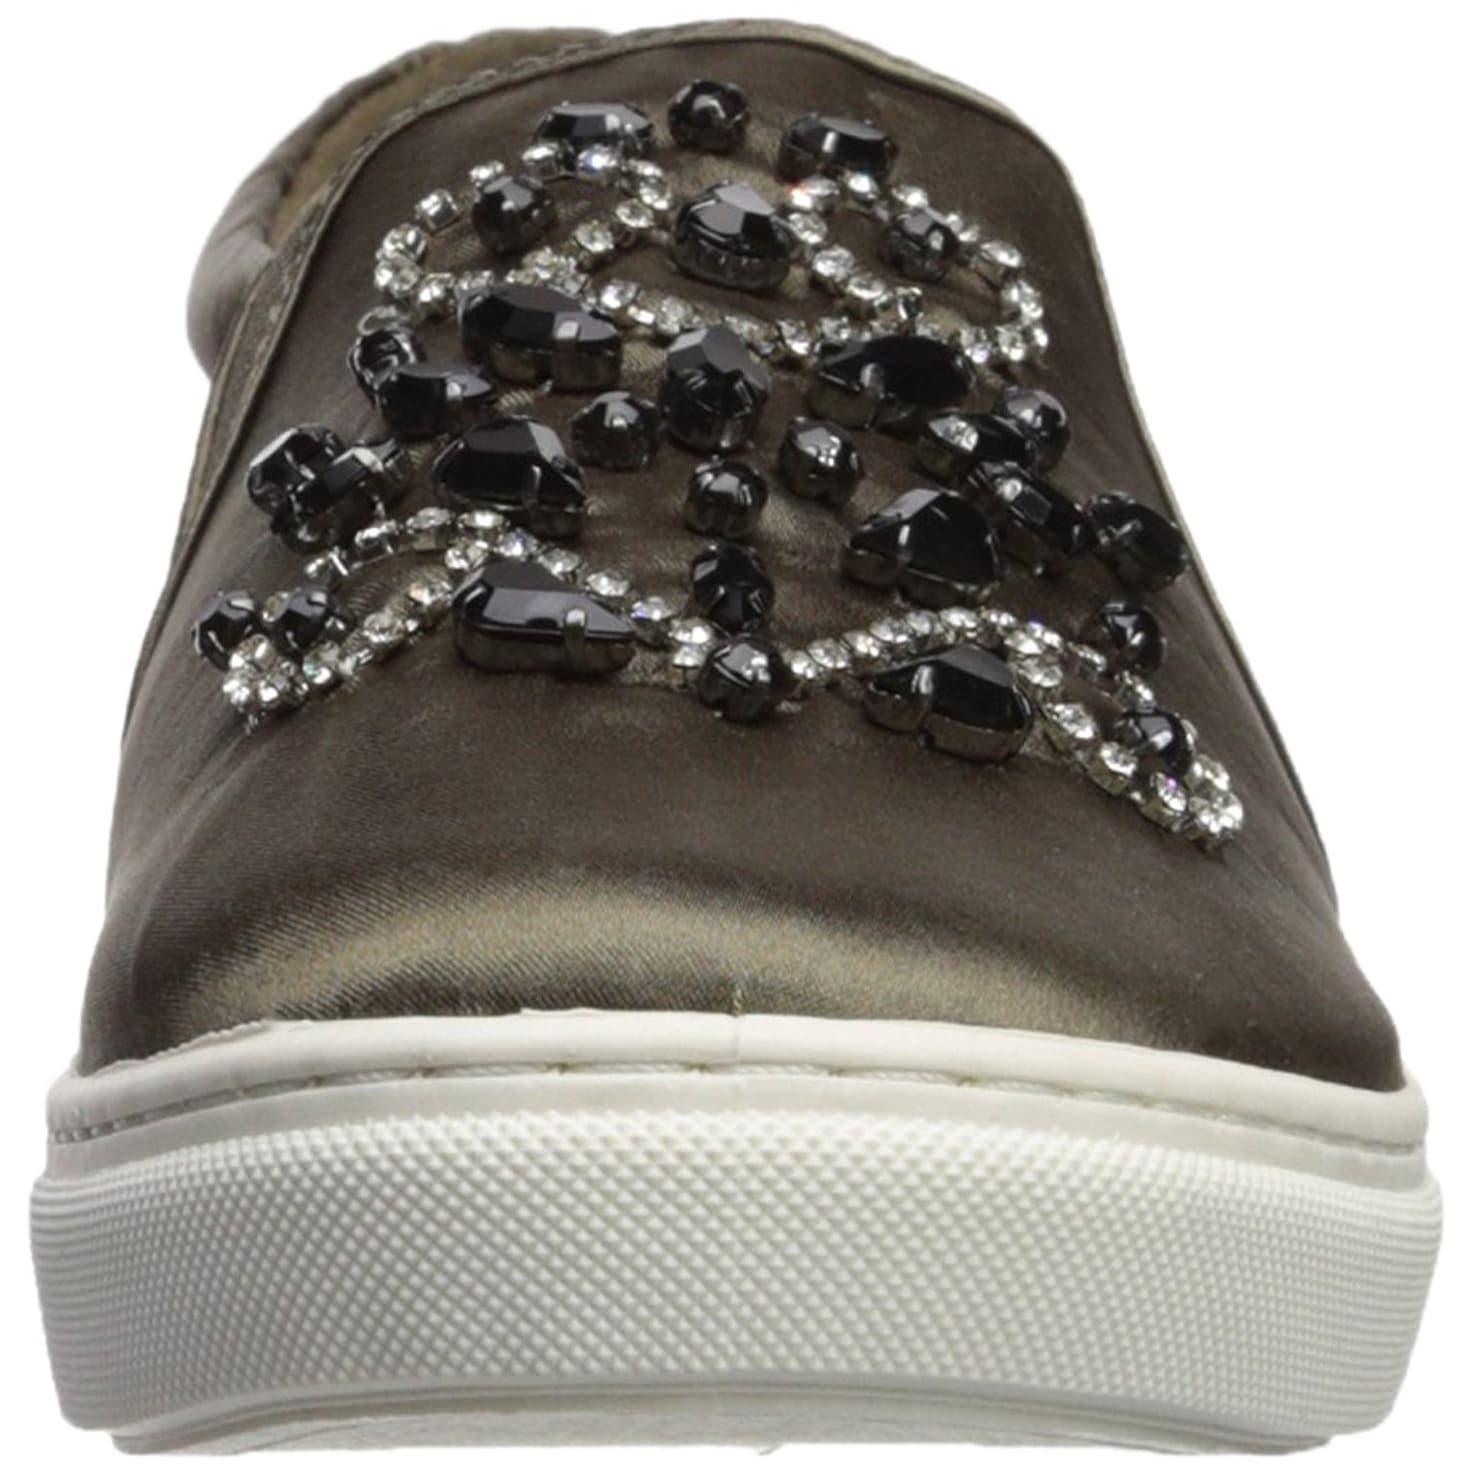 Shop Sugar Women s Sgr-Grasshopper Sneaker - Free Shipping On Orders Over   45 - Overstock.com - 21594671 4df576663